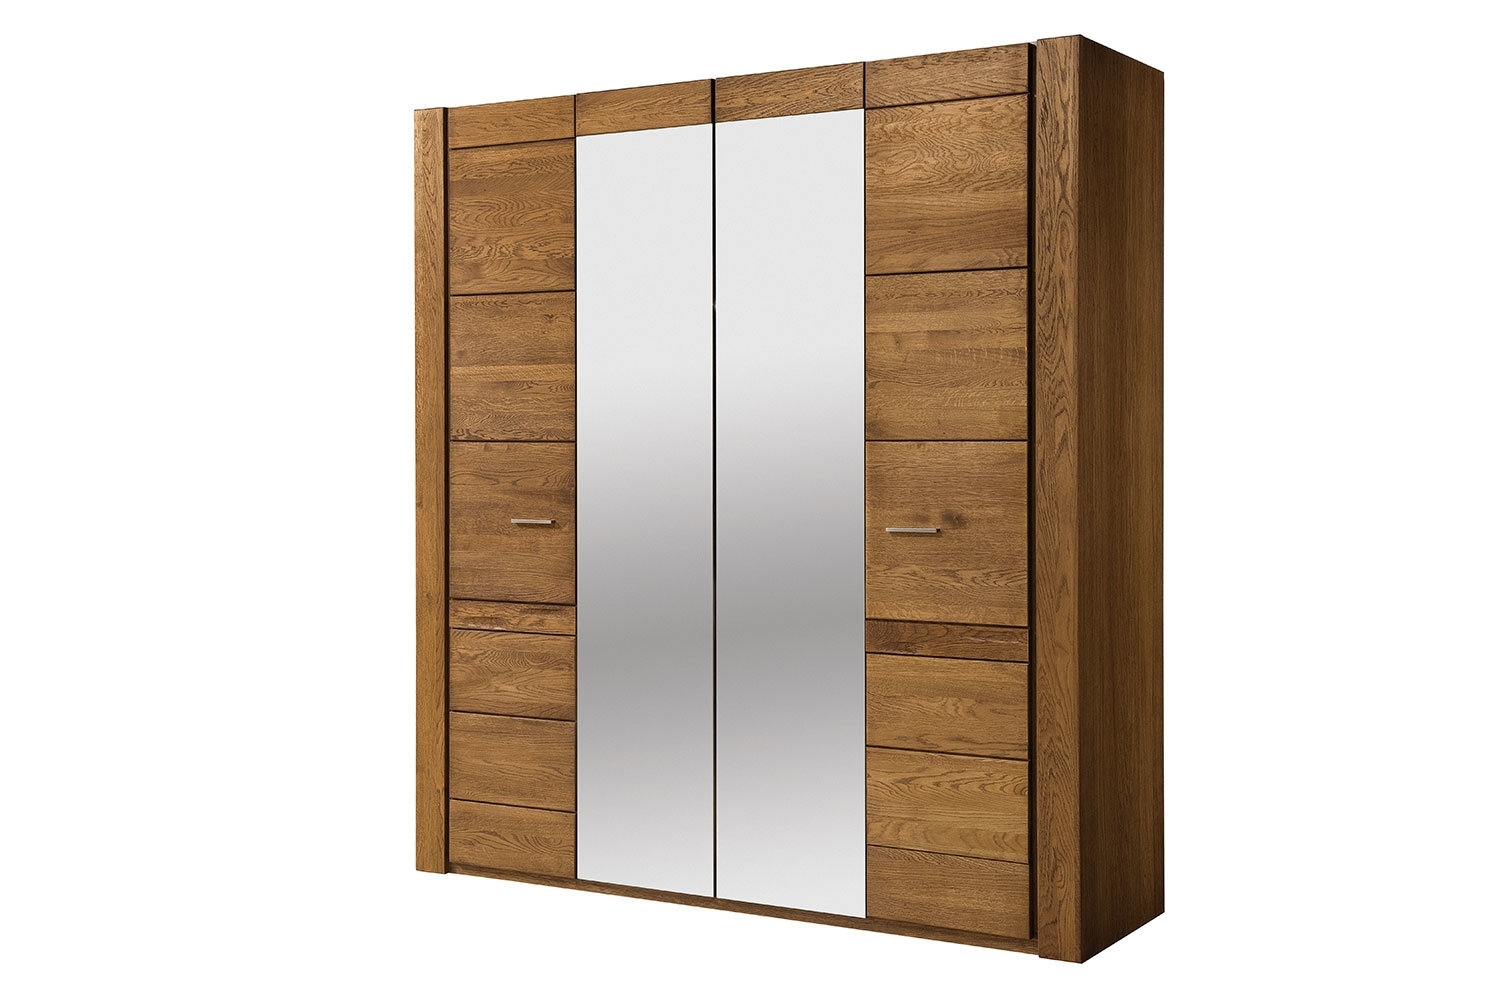 Dulap din furnir si pal, cu 4 usi si oglinda Velvet 77 Stejar Rustic, l205xA60xH225 cm imagine